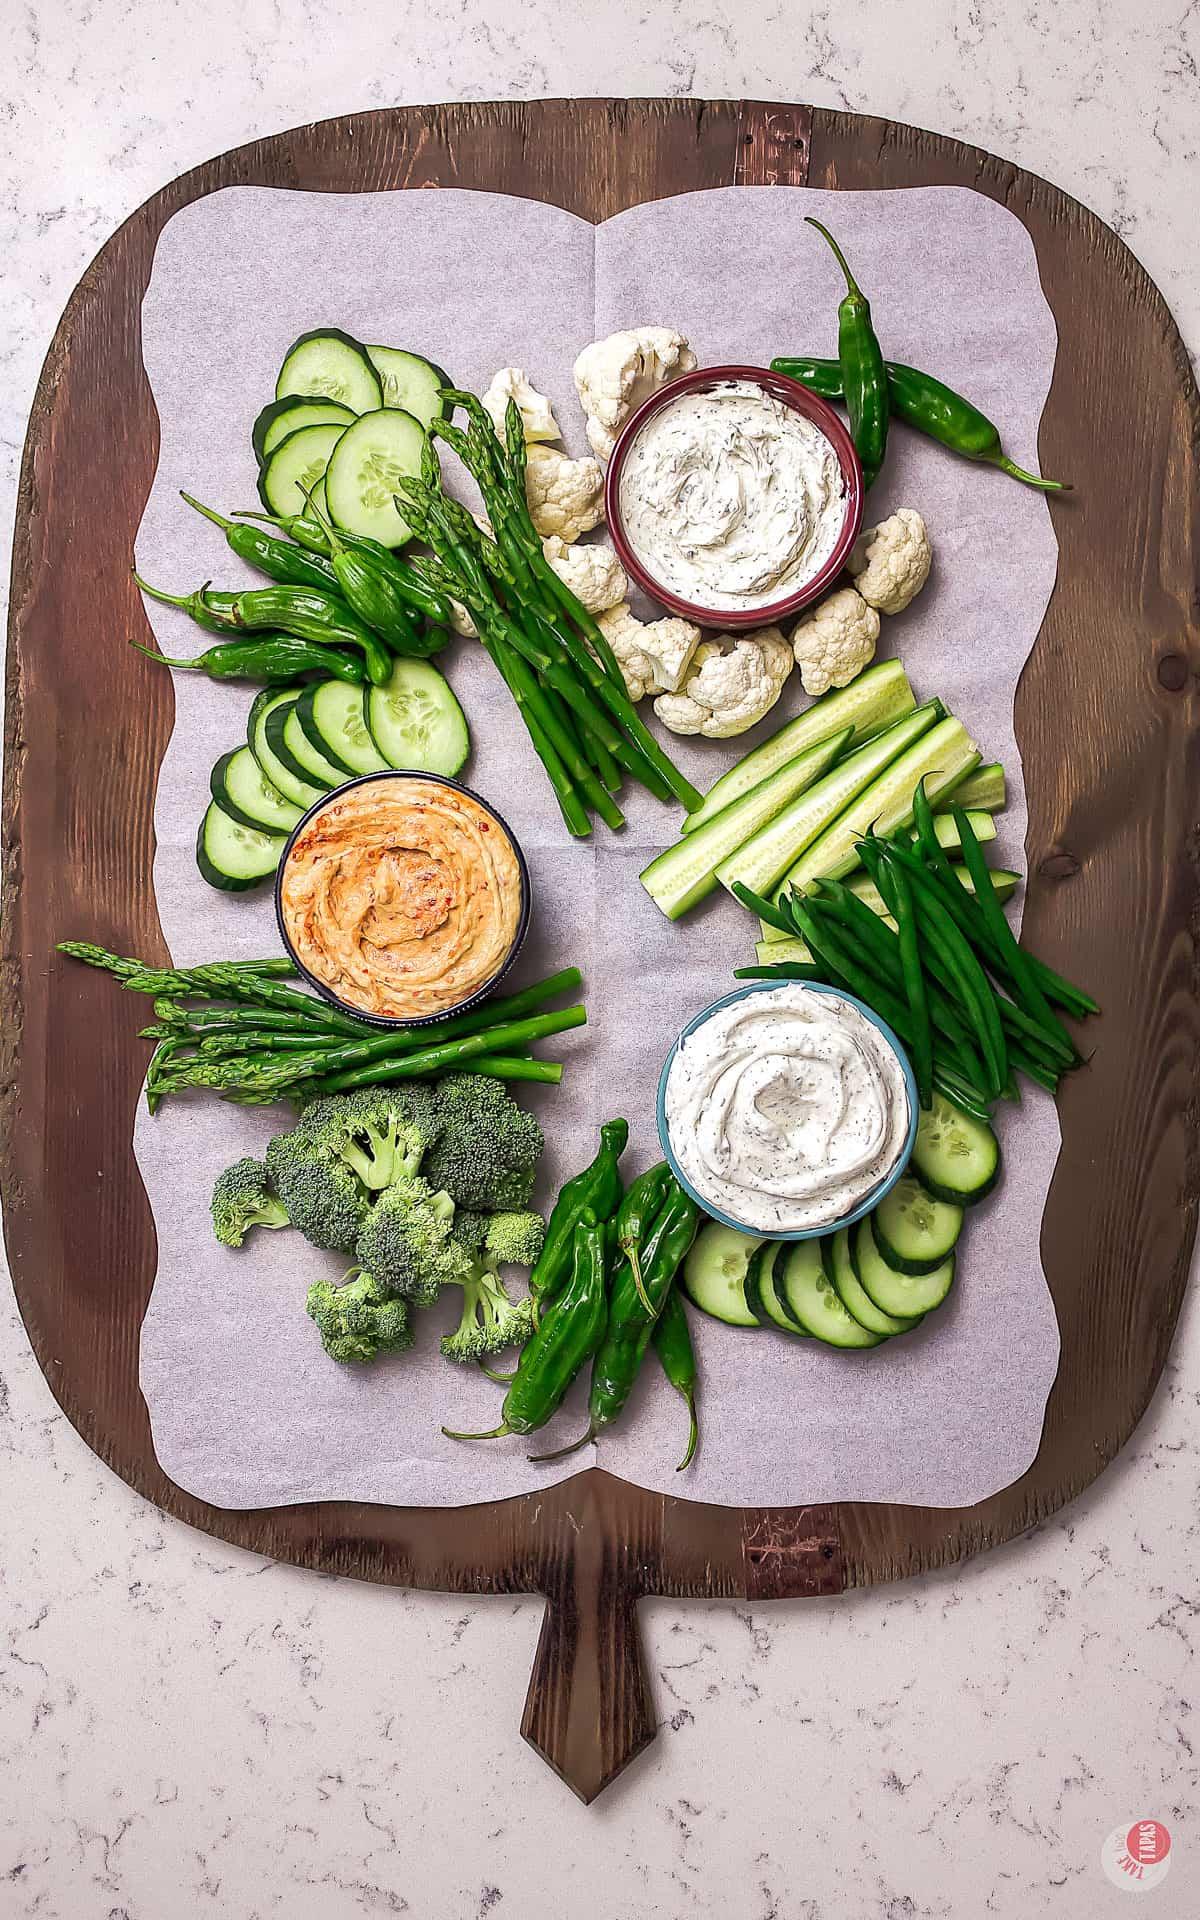 more green vegetables on platter